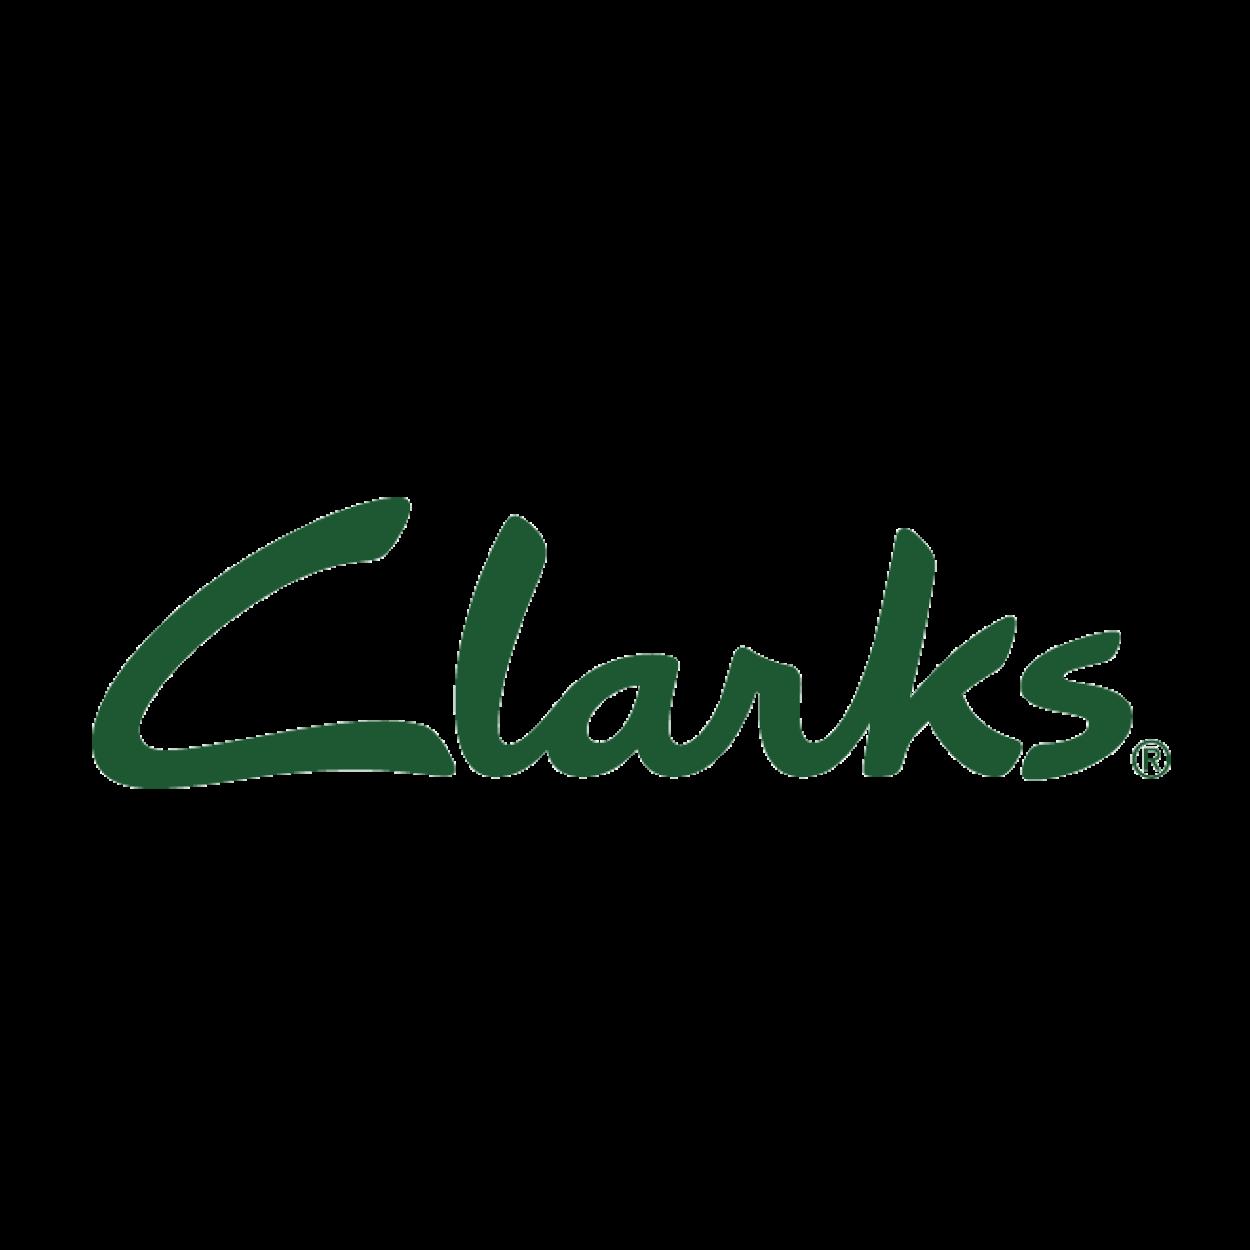 LOGO_CLARKS.png